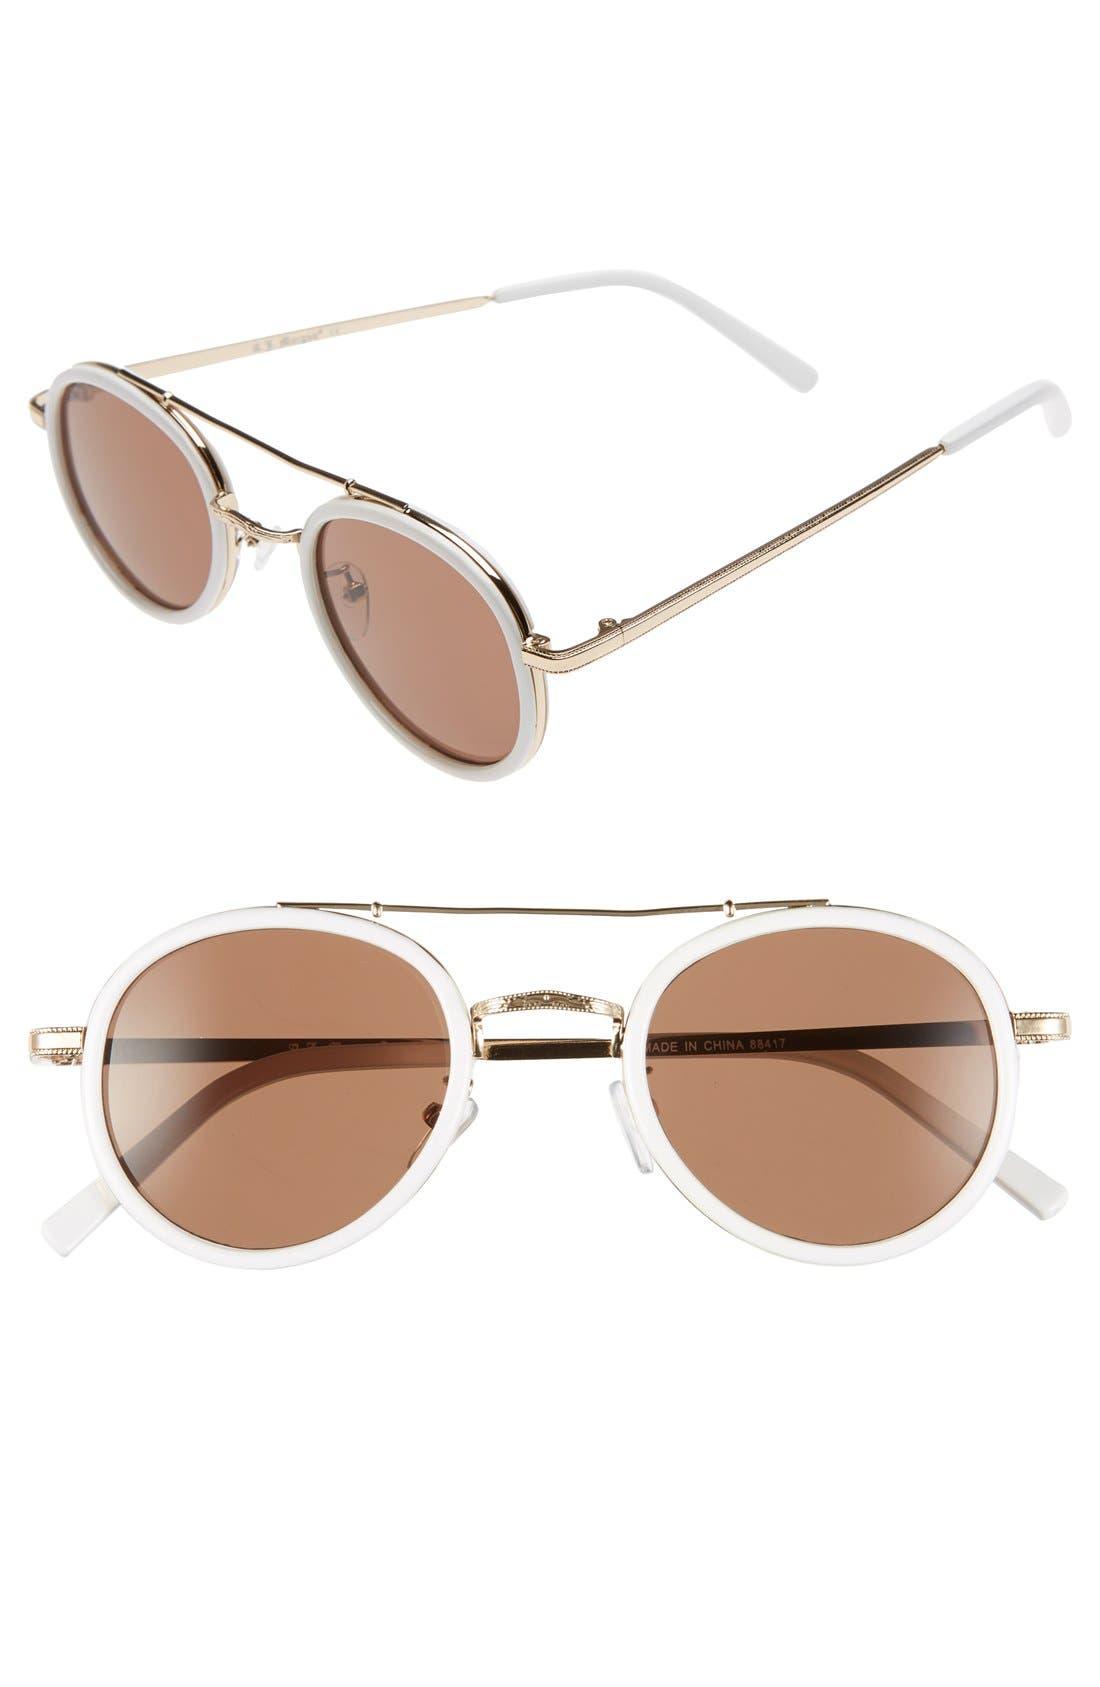 Main Image - A.J. Morgan 'Cocktail' 47mm Sunglasses